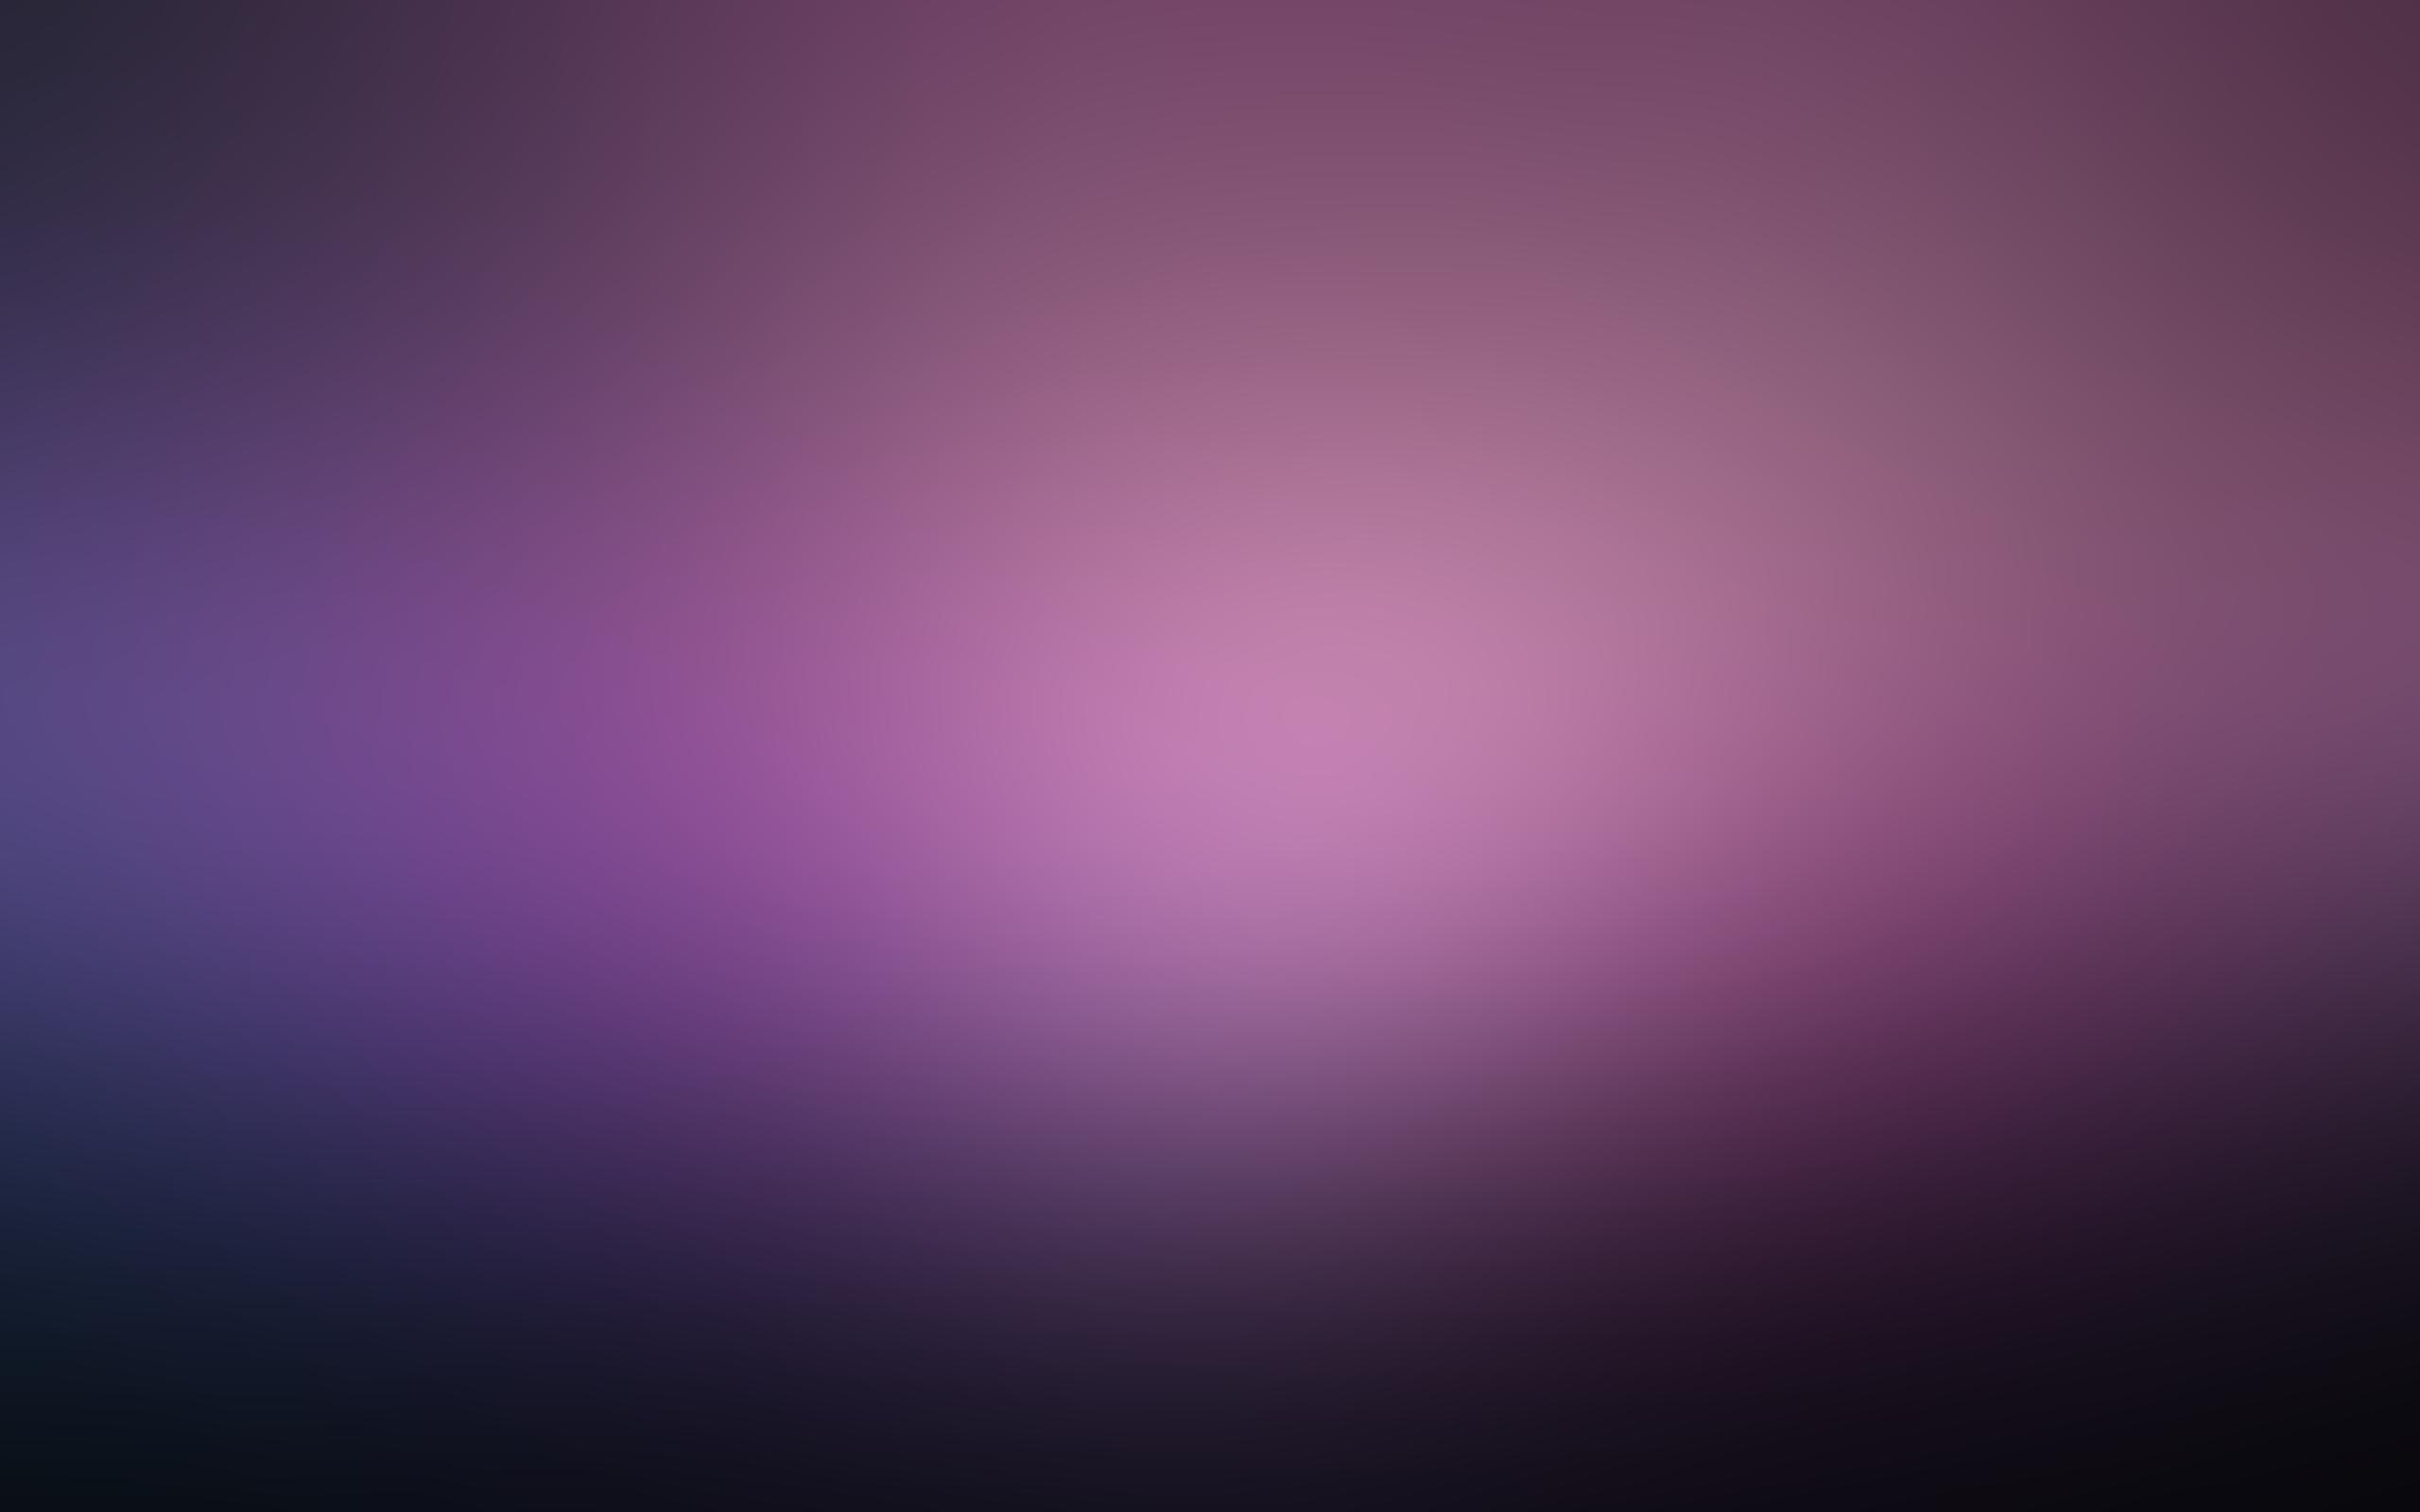 Aurora Blur by SkateAddiction